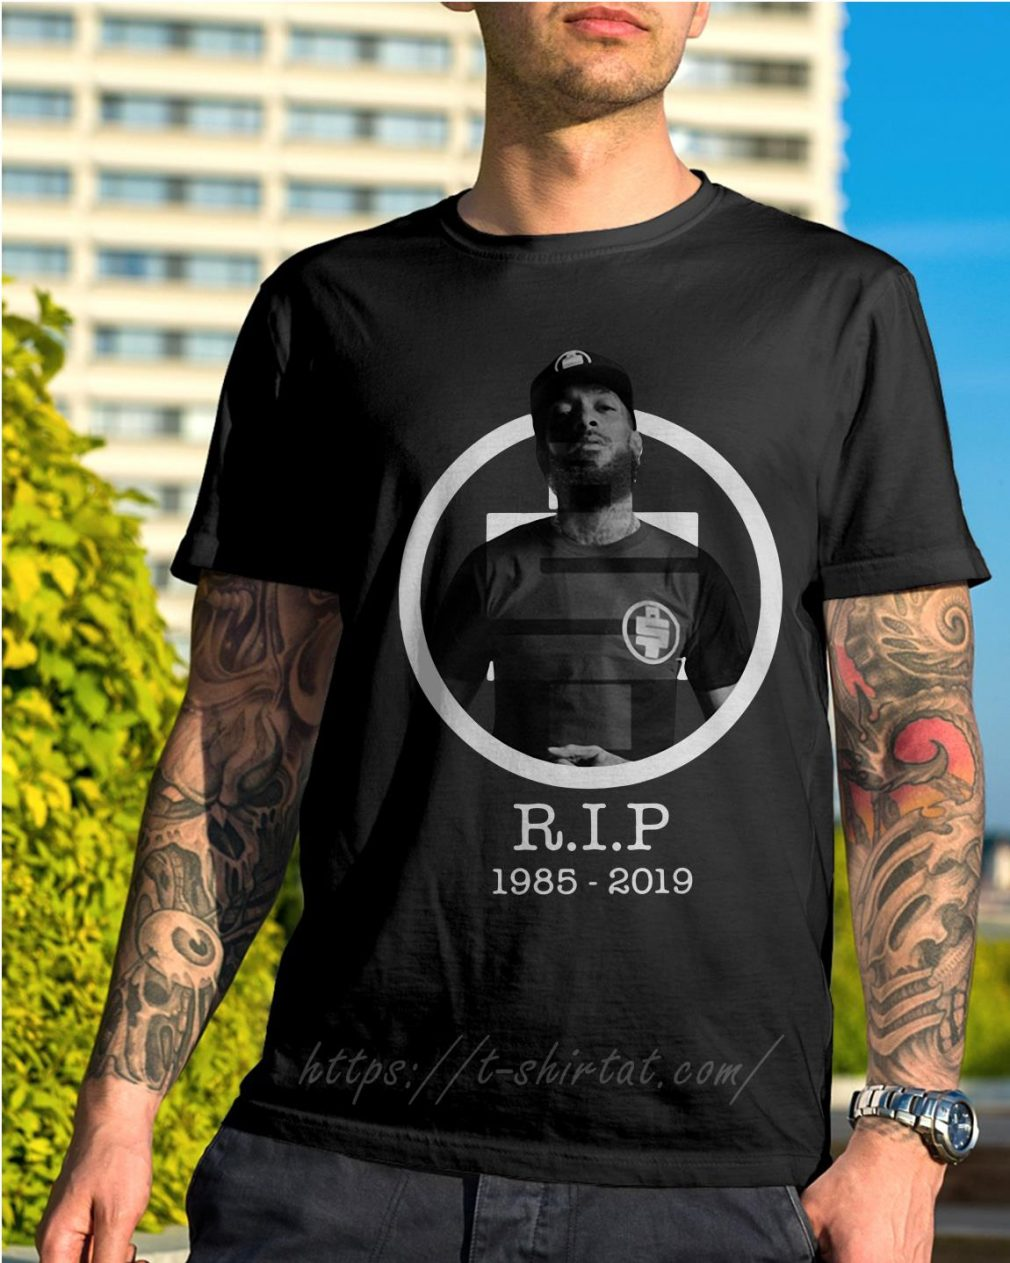 All Money In RIP Nipsey Hussle 1985-2019 shirt